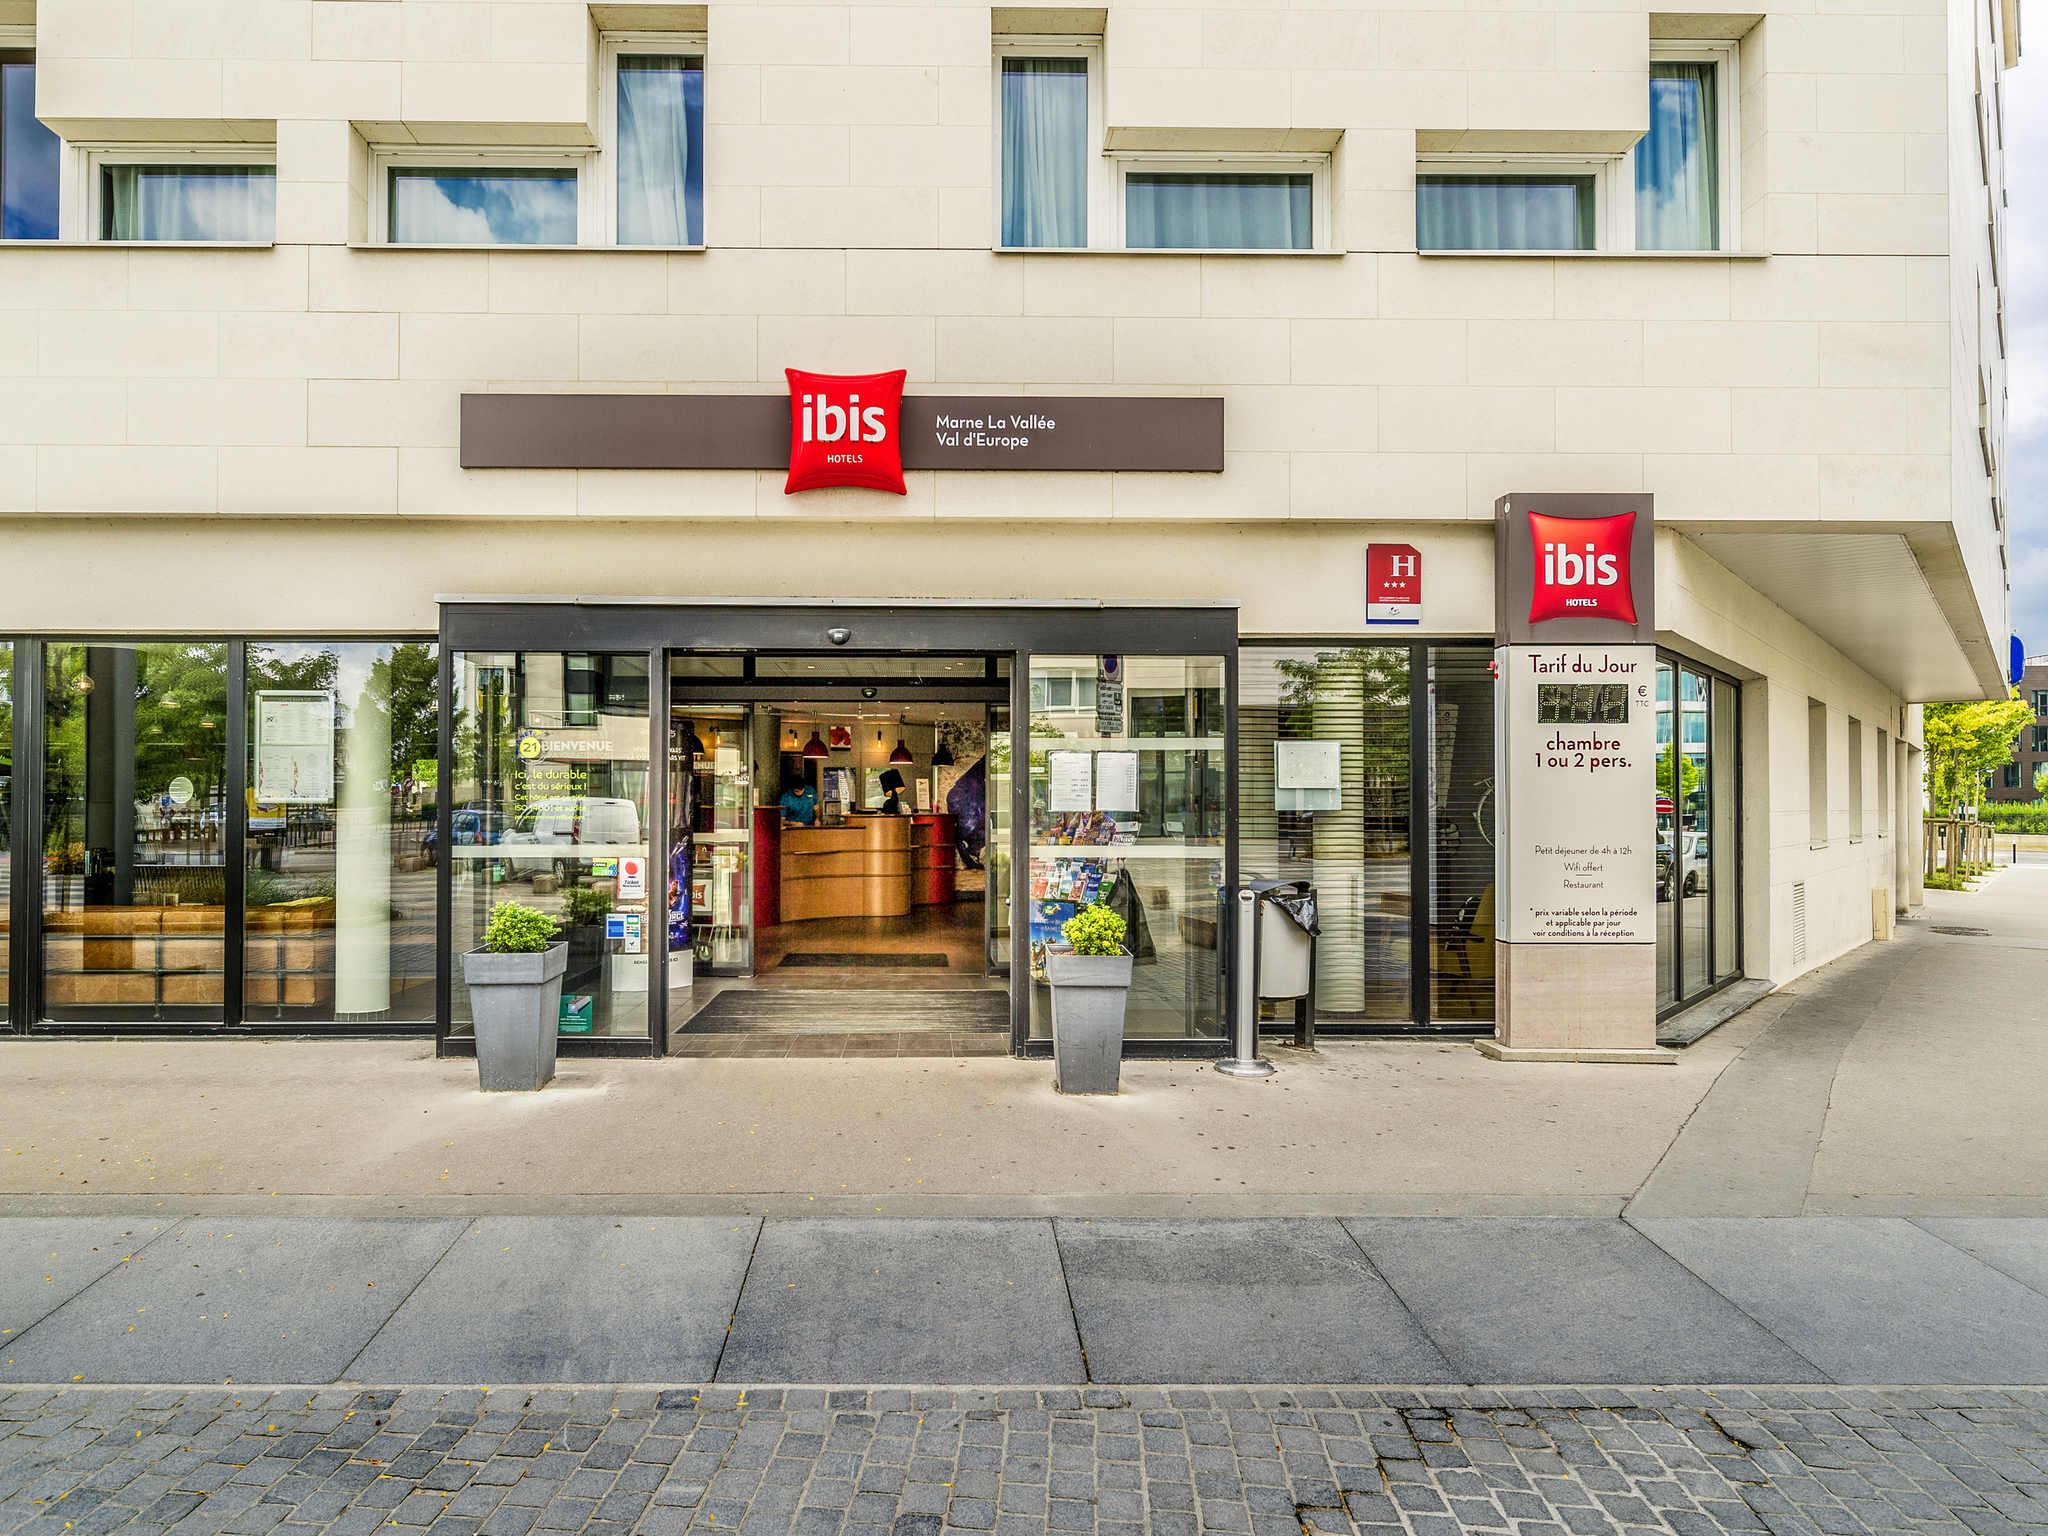 Hotel – ibis Marne-la-Vallée Val d'Europe